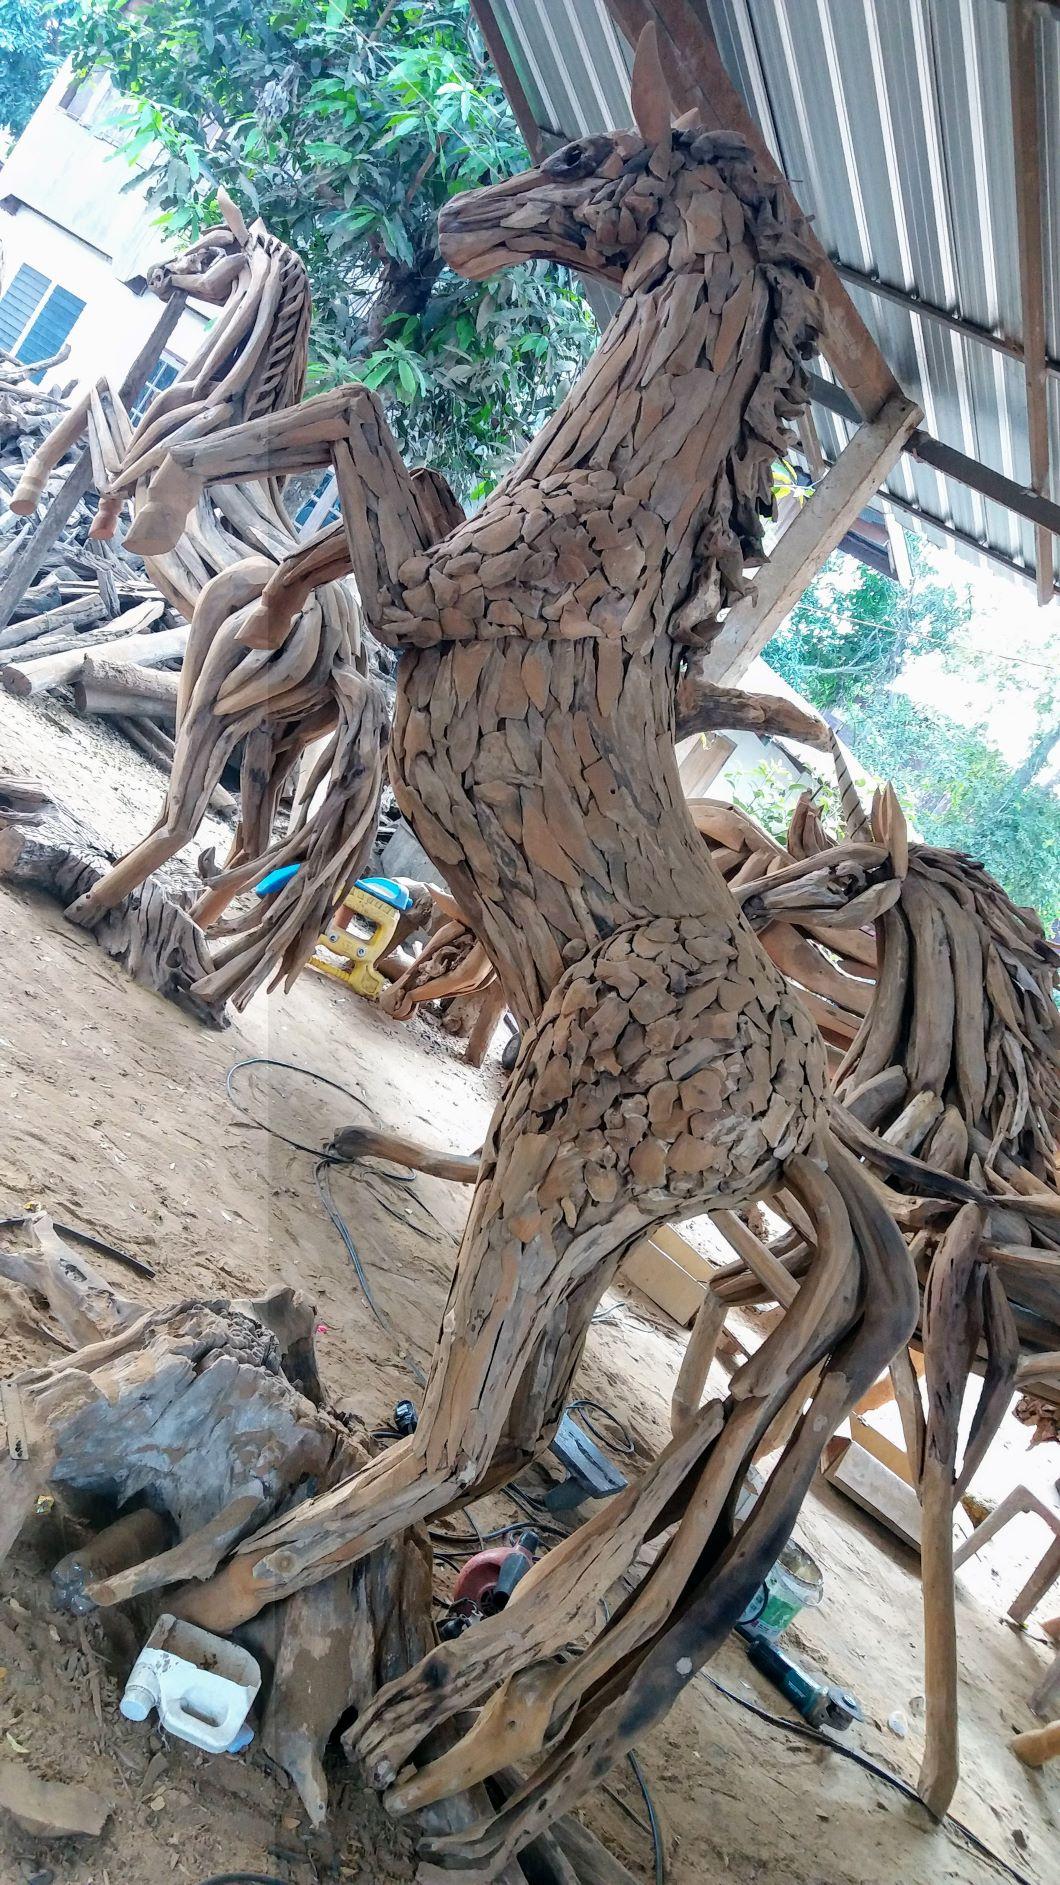 DriftwoodHorse950